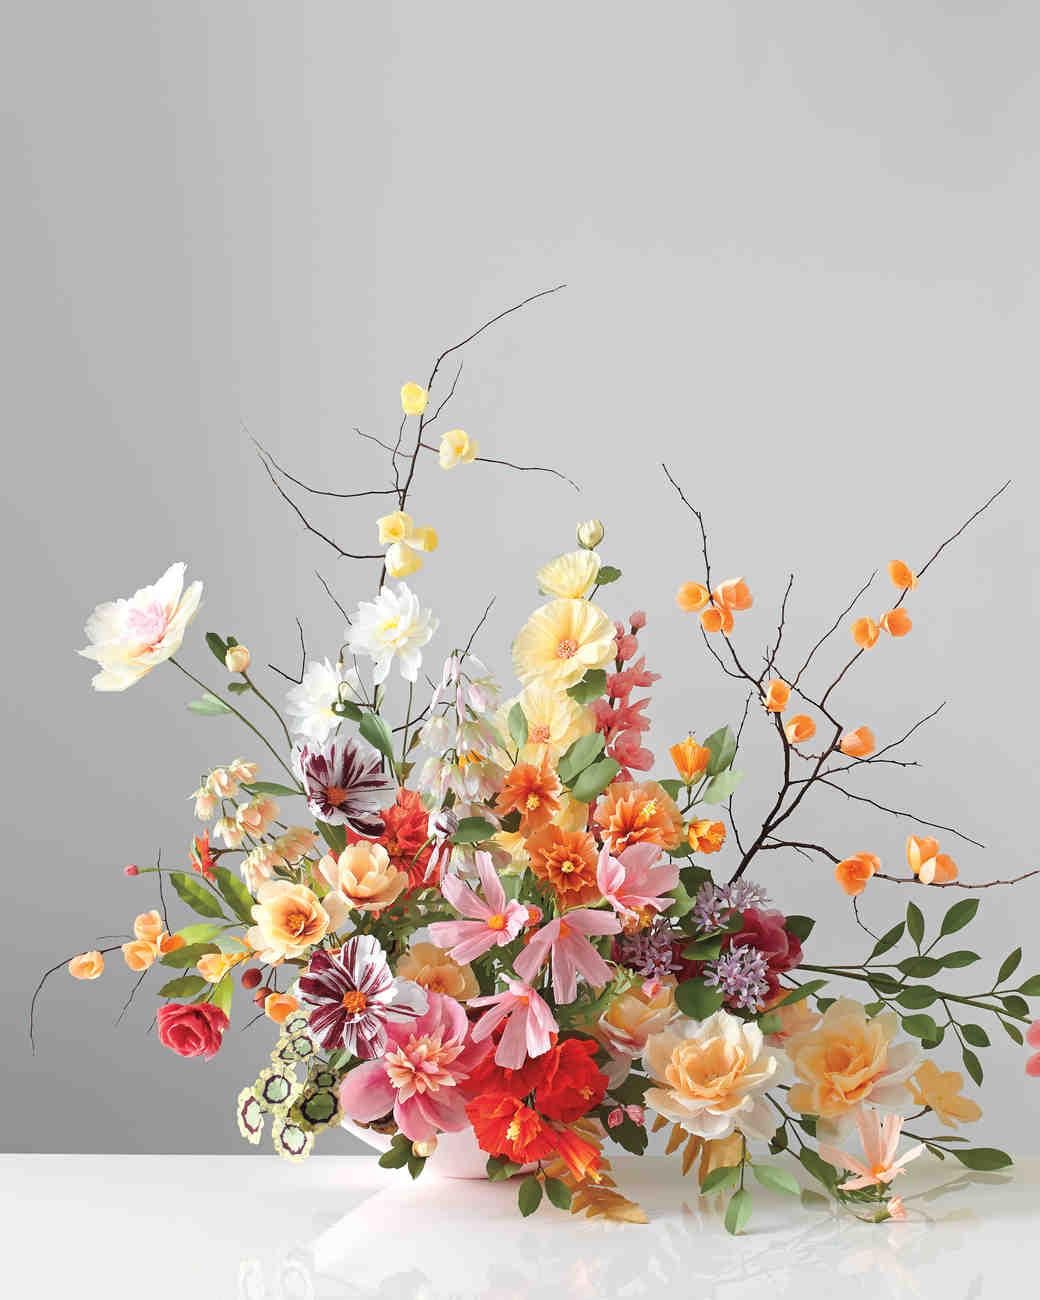 Orange Fall Peonies Wallpaper How To Make Paper Flowers Martha Stewart Weddings